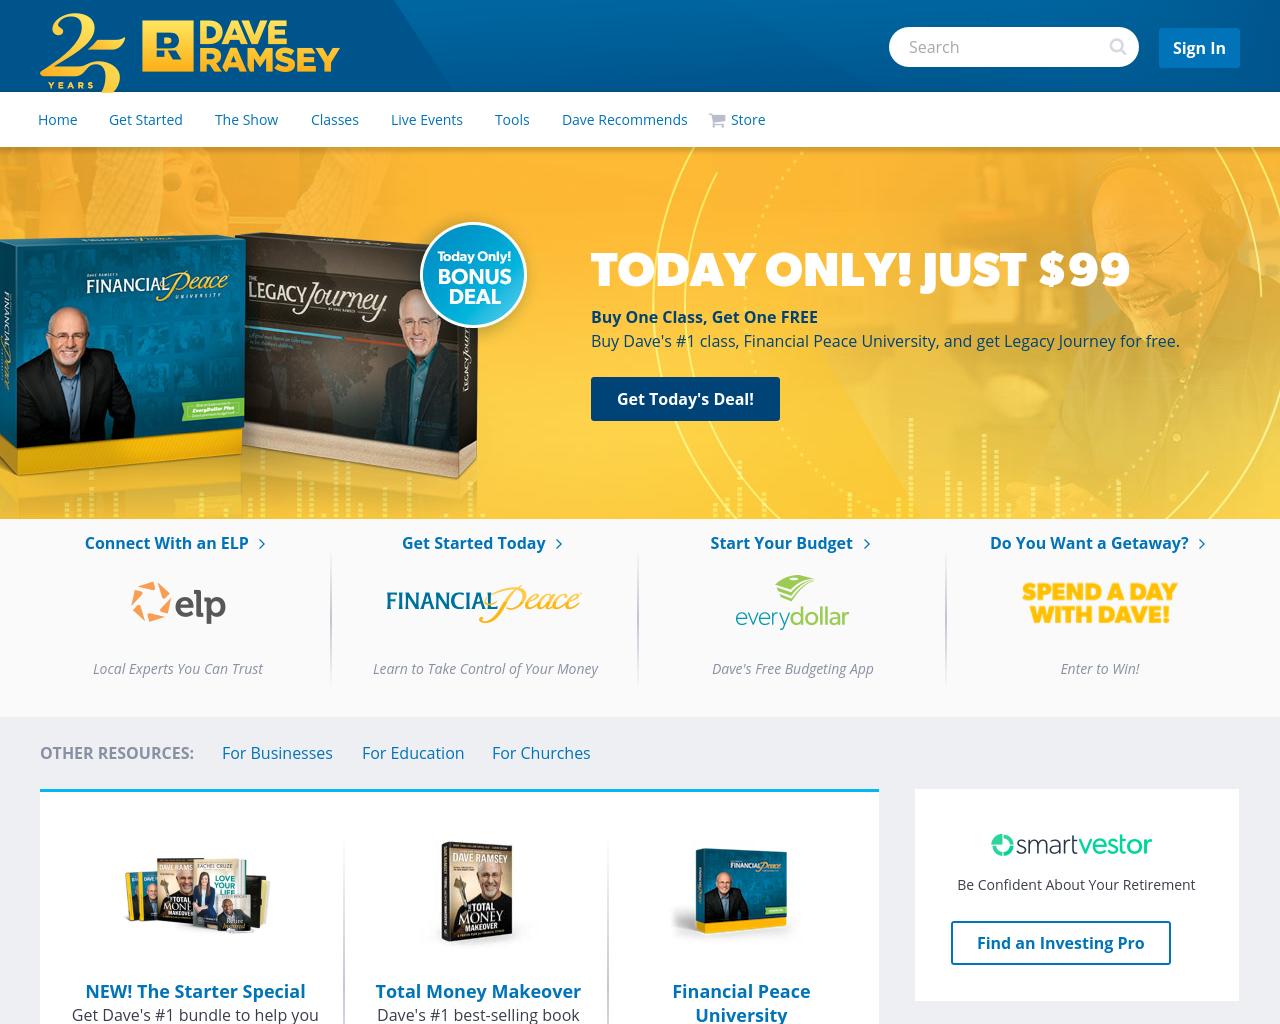 Dave-Ramsey-Advertising-Reviews-Pricing